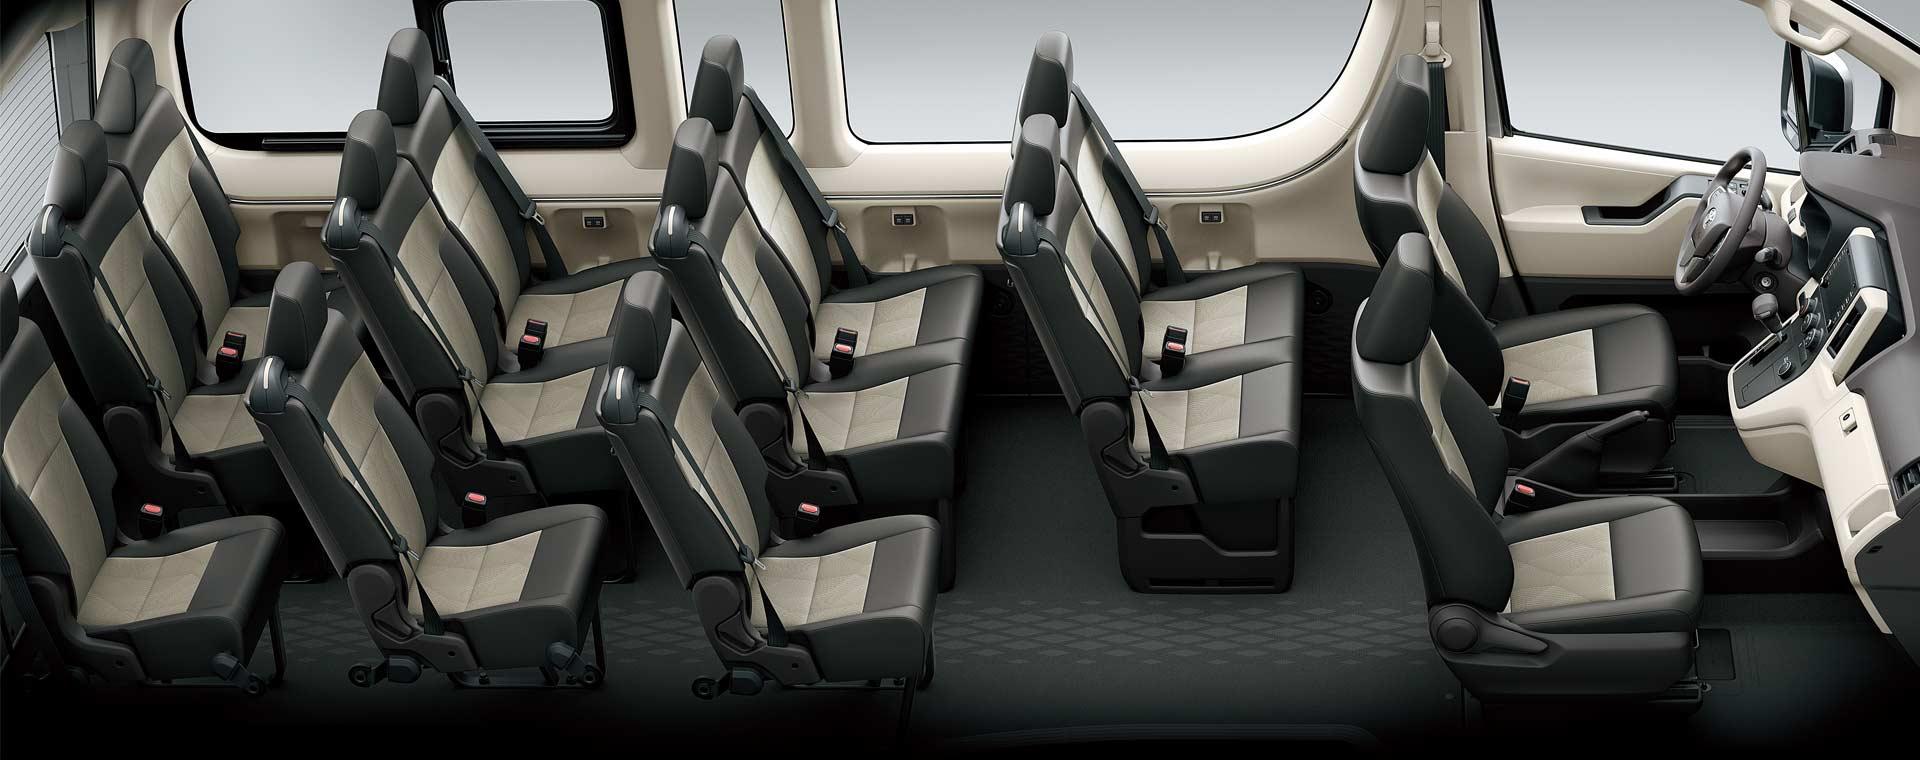 2019-6th-generation-Toyota-Hiace-Interior_3